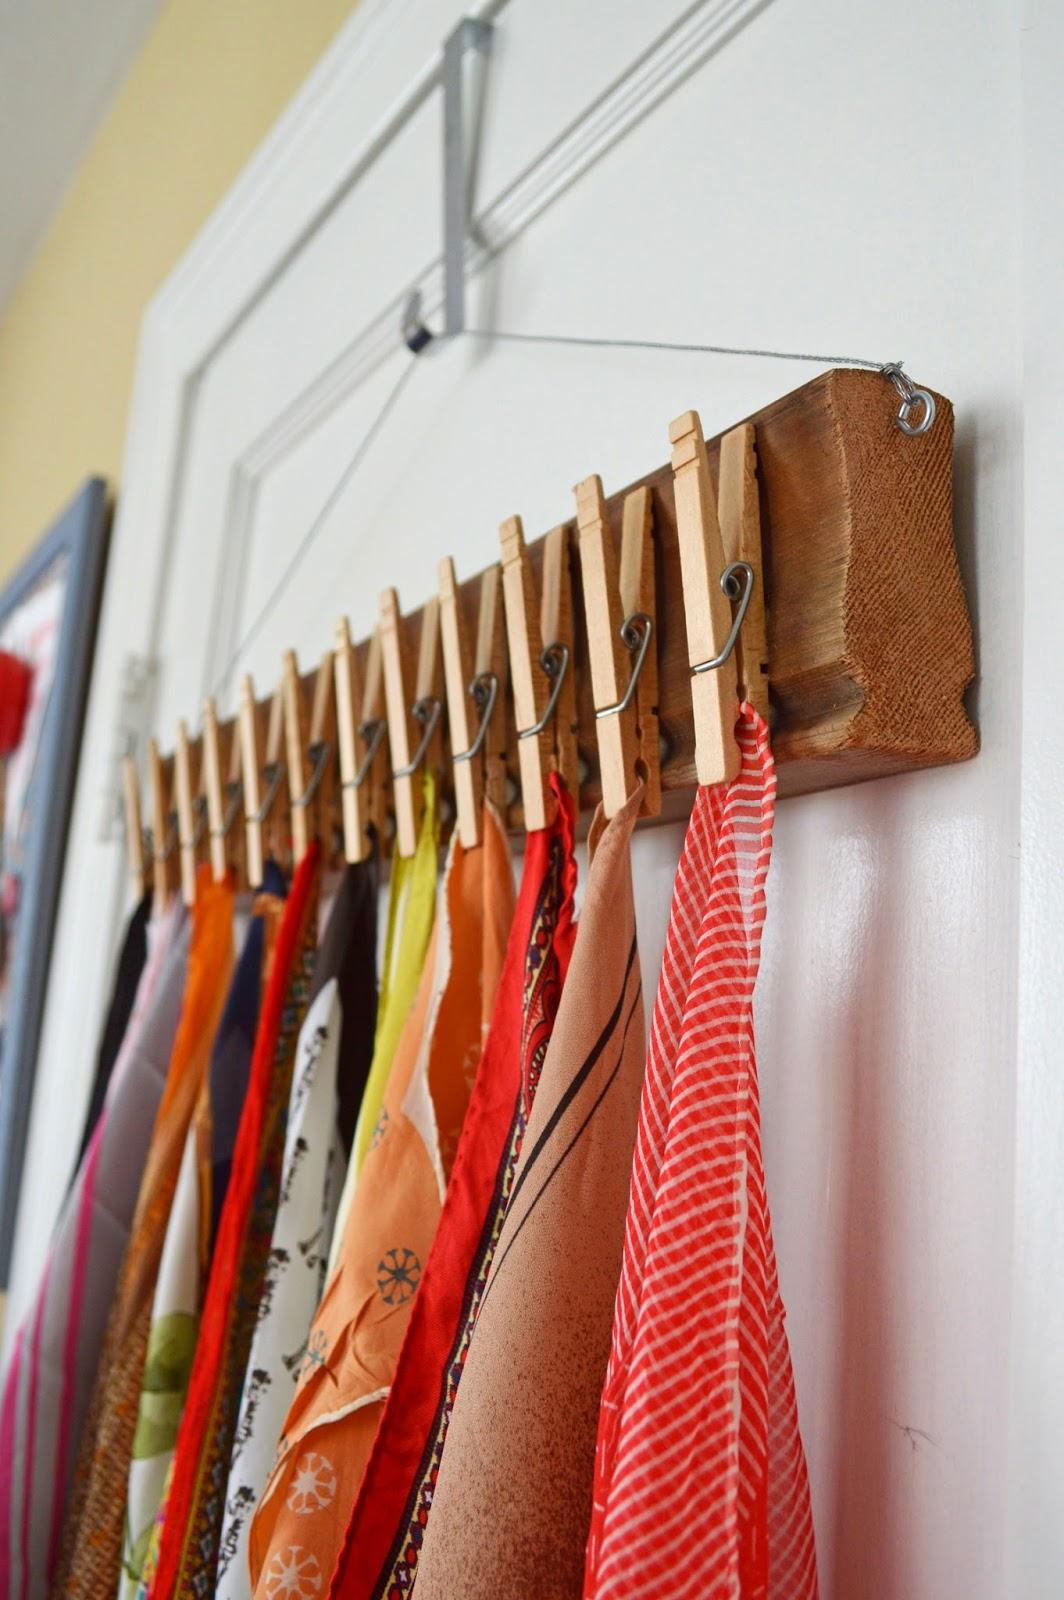 scarf-clothespin-storage